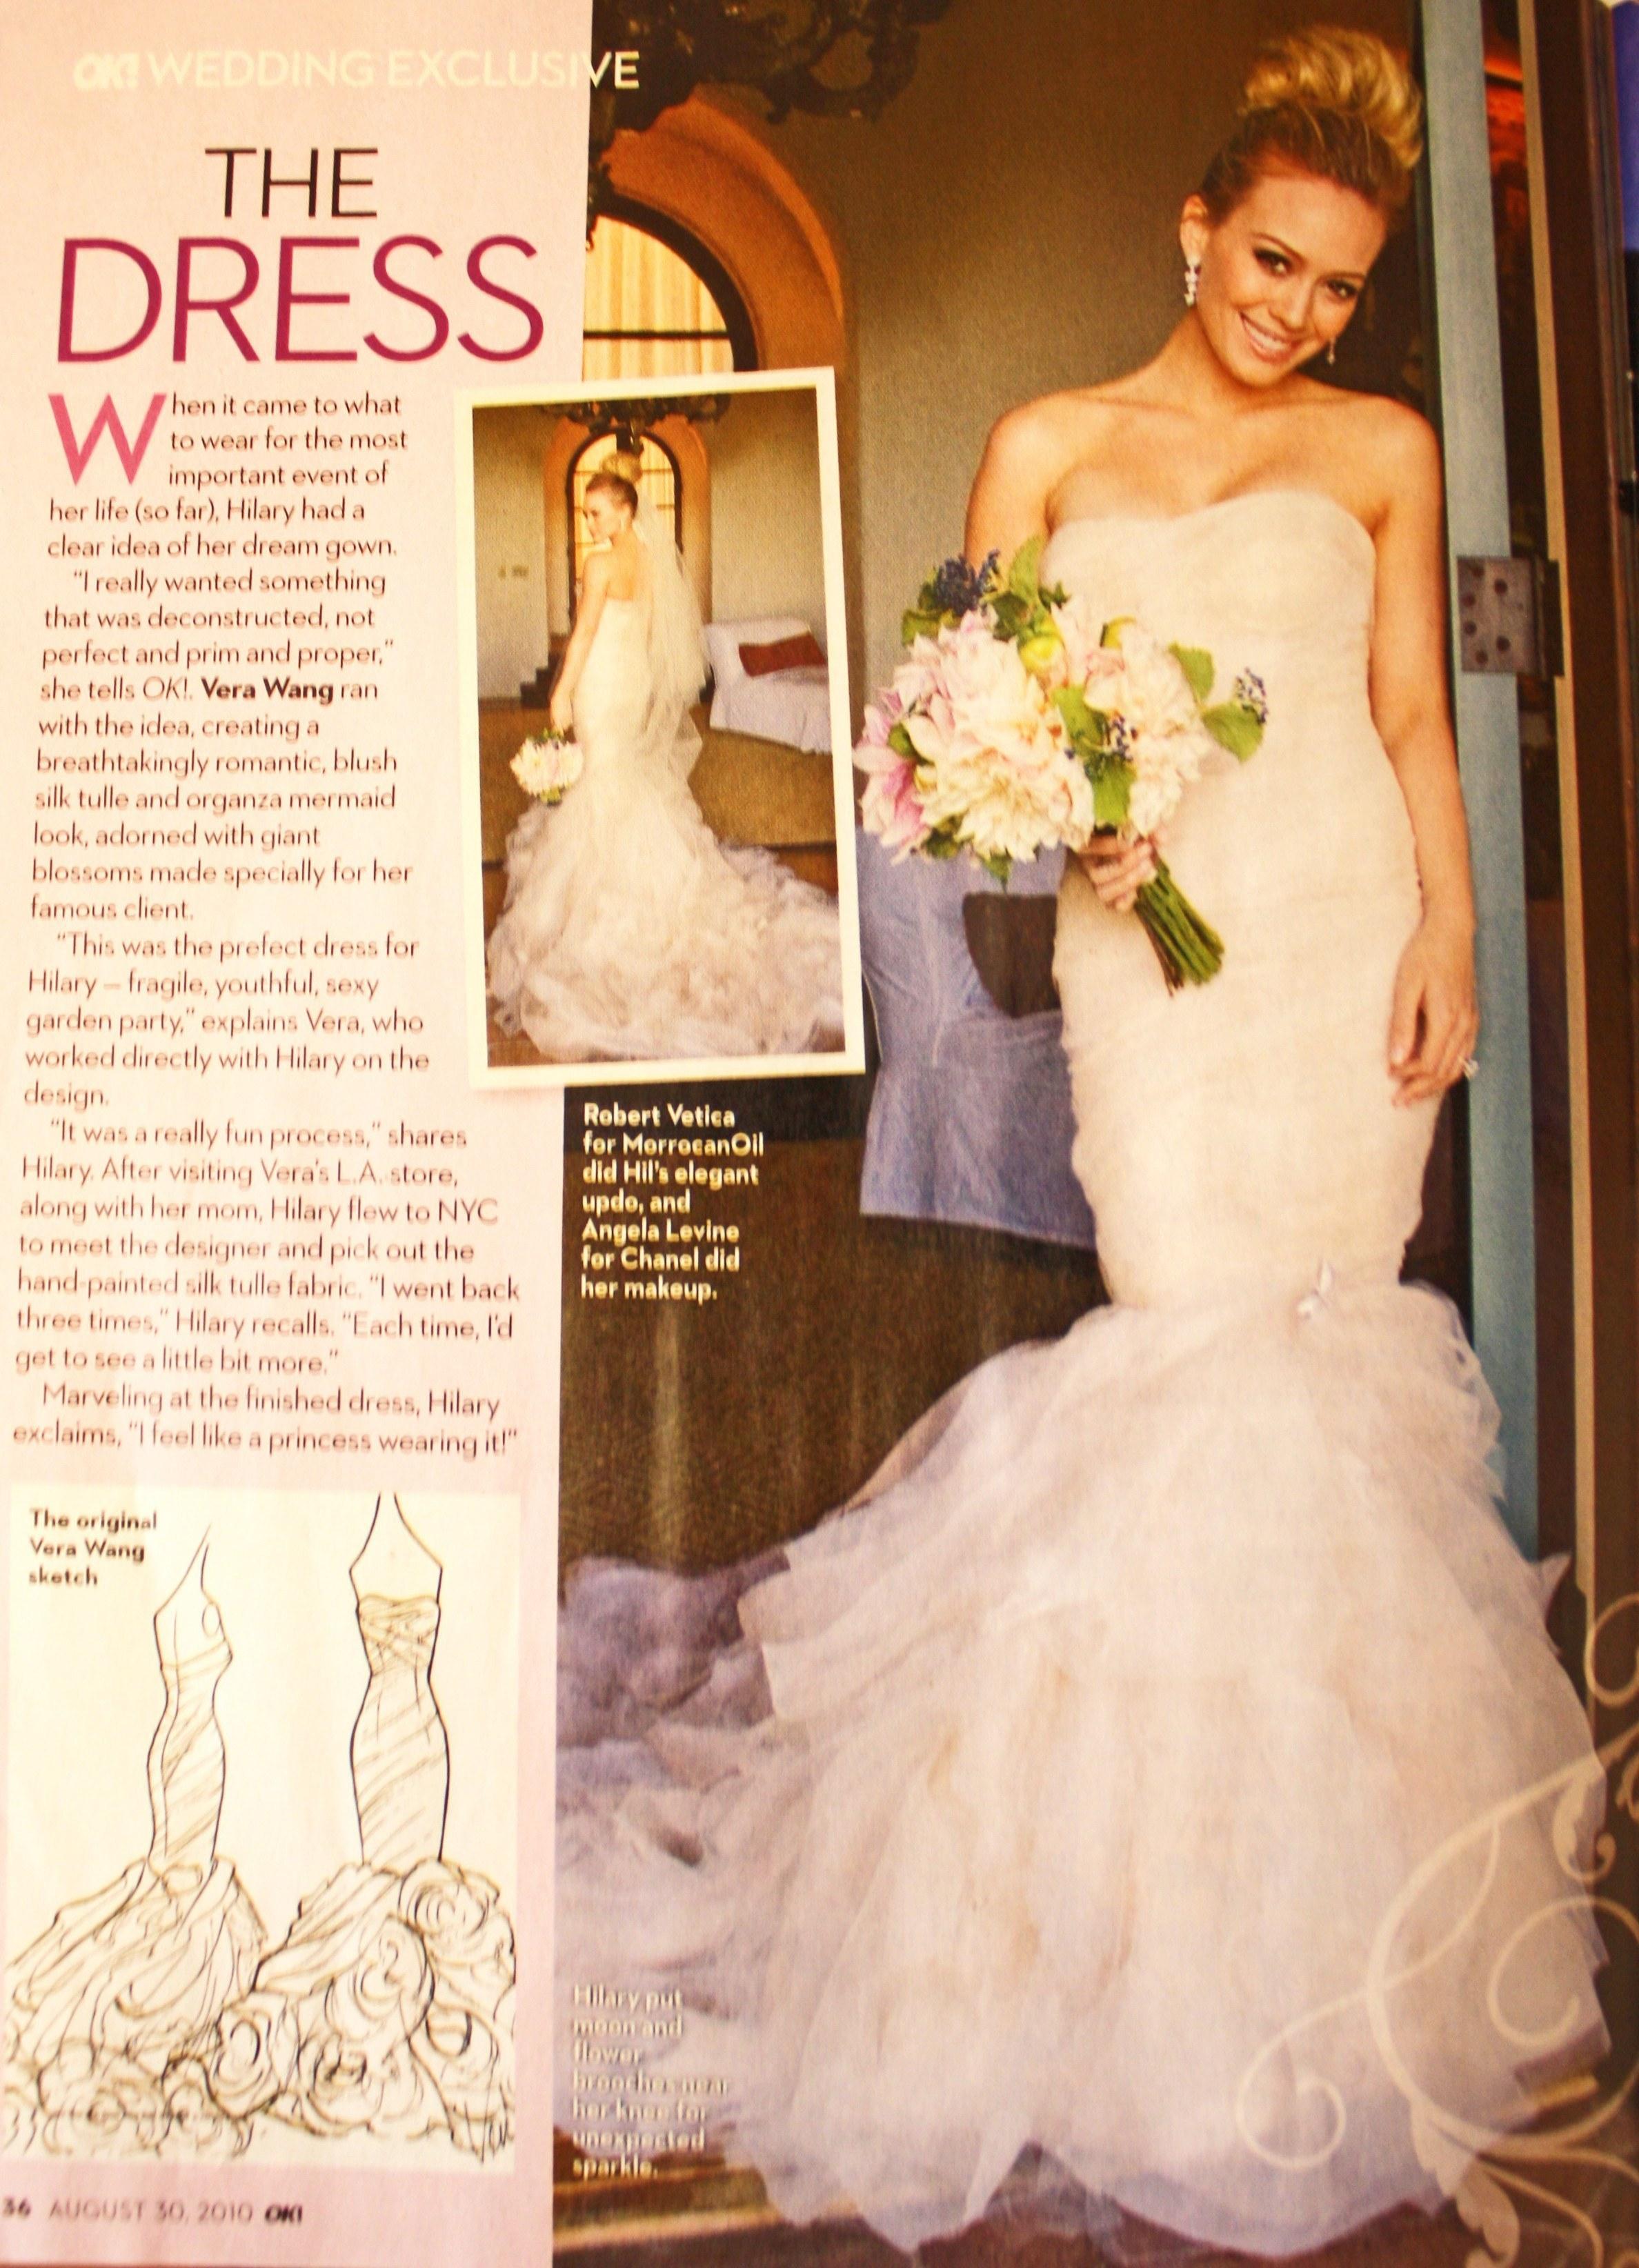 Ide Bridesmaid Hijab Styles Bqdd Wedding Ideas White and Gold Wedding Dress the Newest